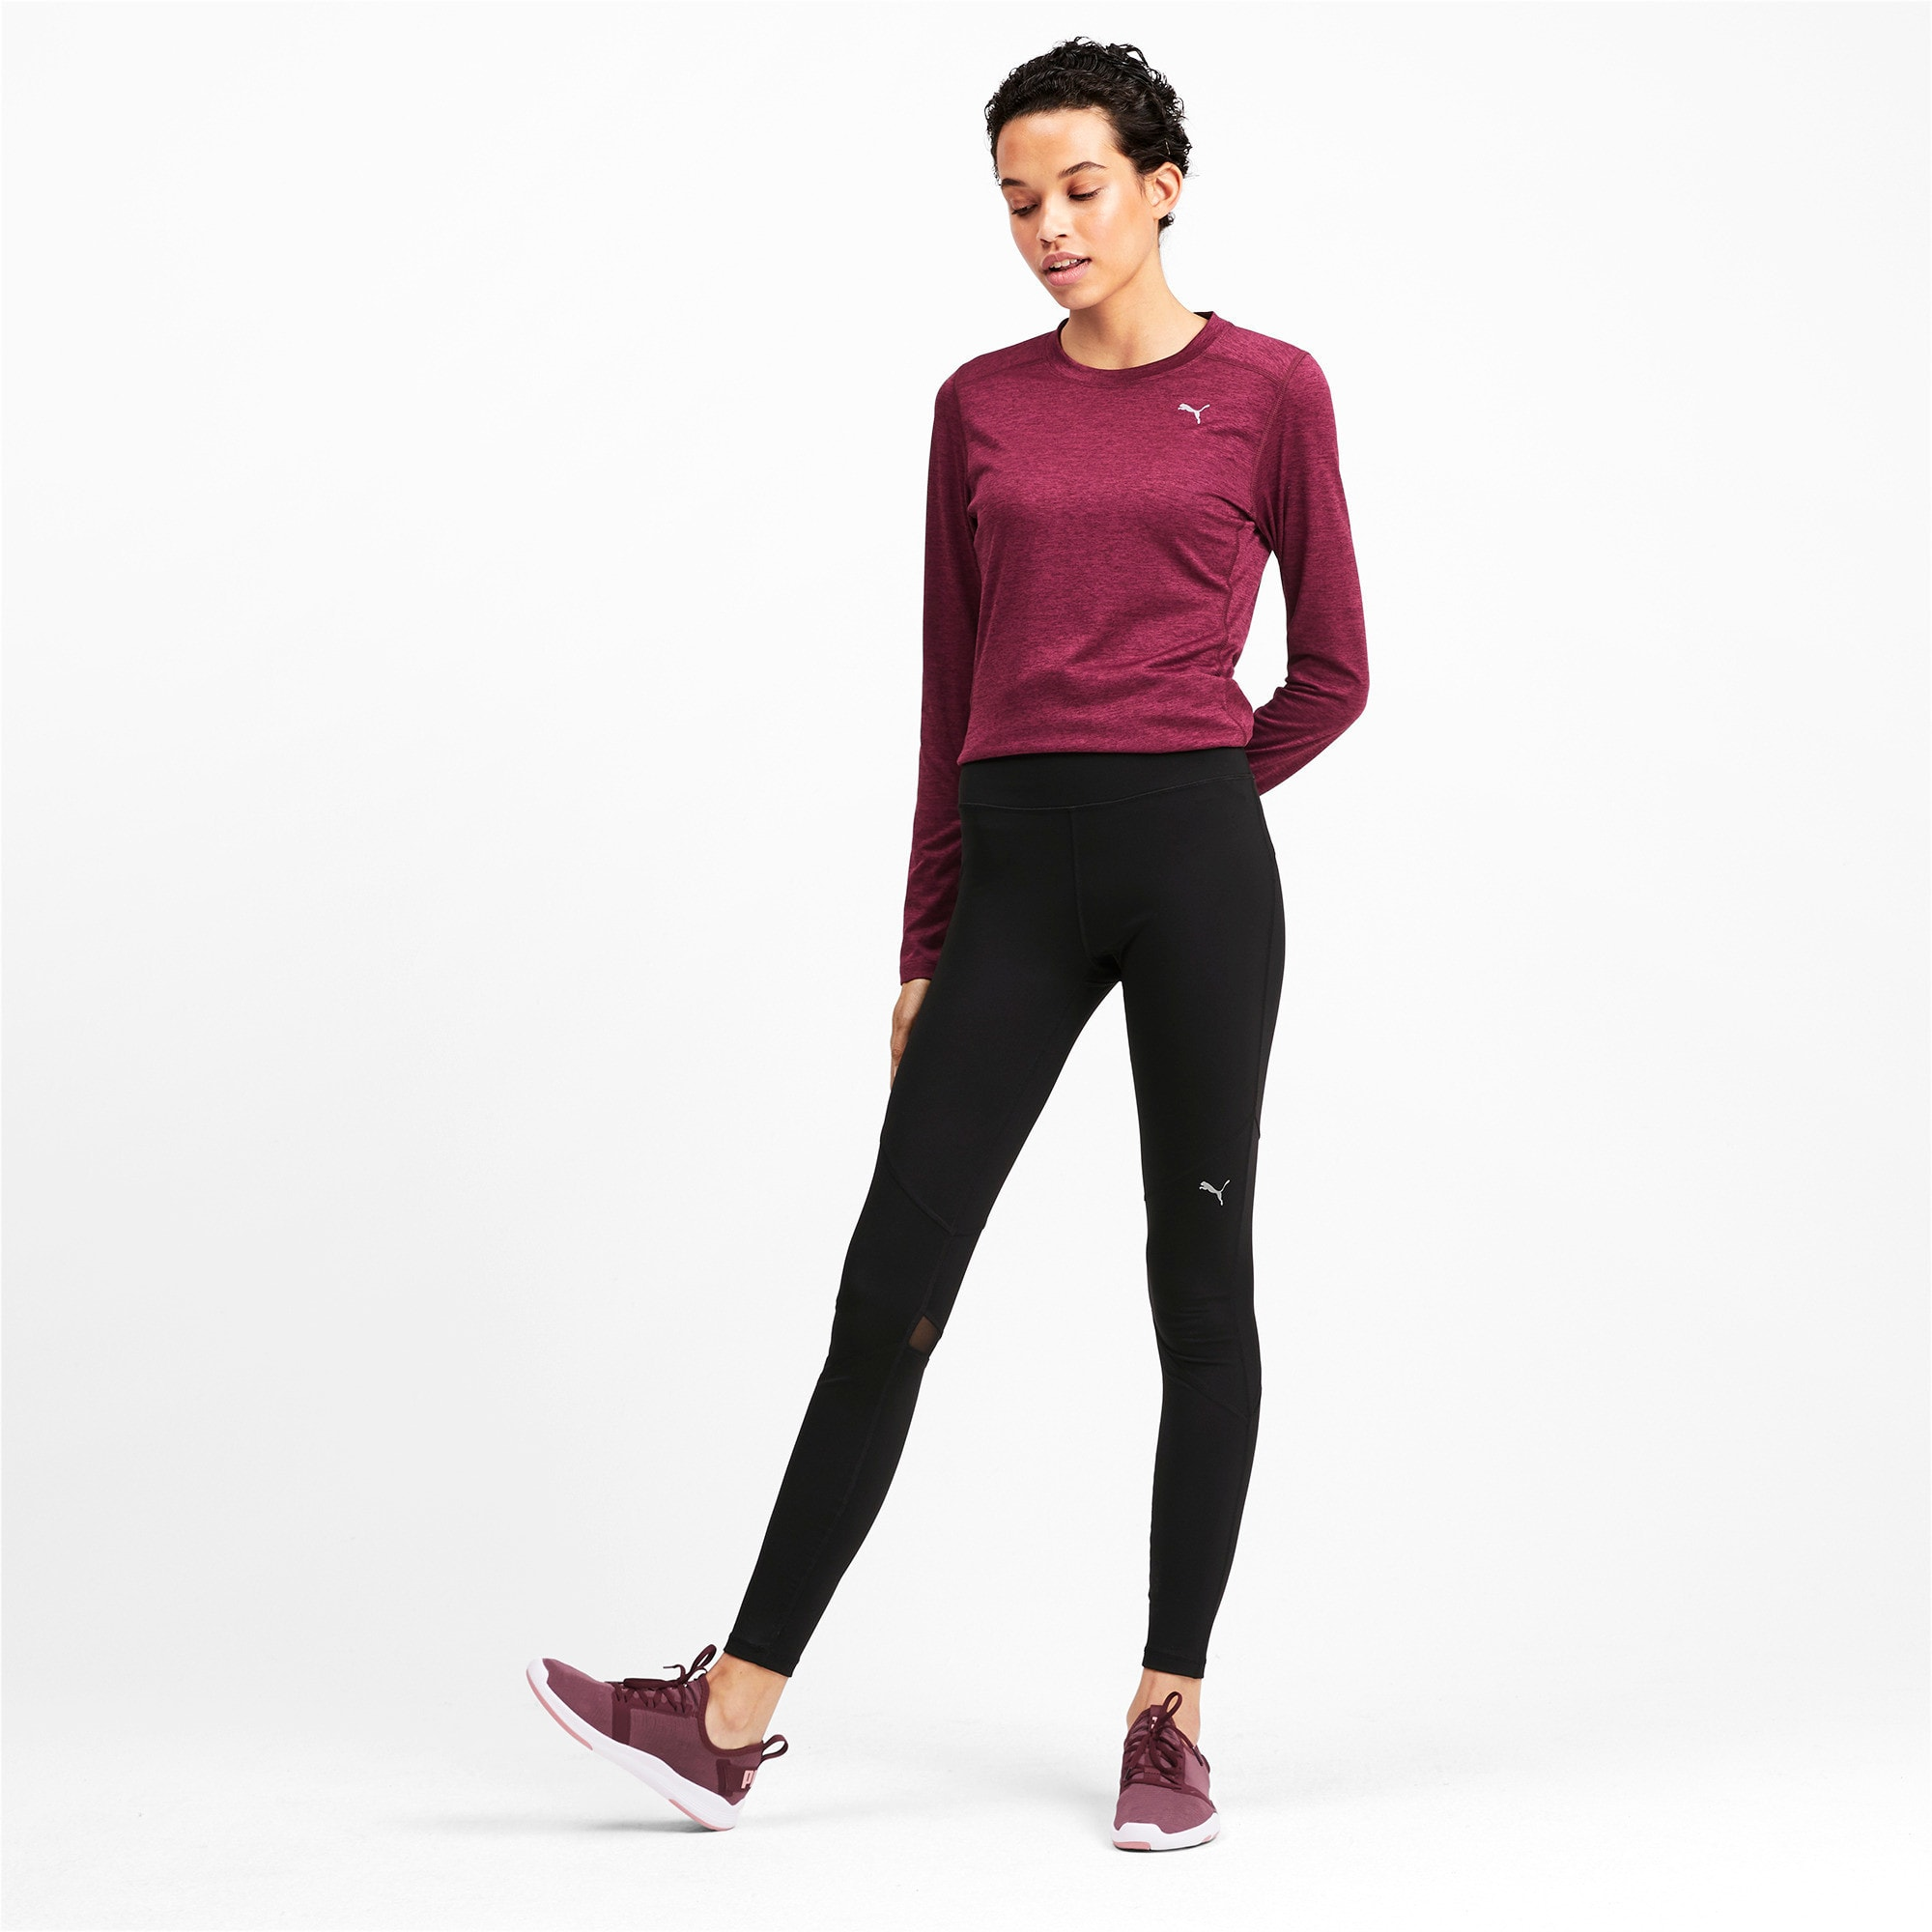 Thumbnail 3 of IGNITE Women's Running Tights, Puma Black, medium-IND